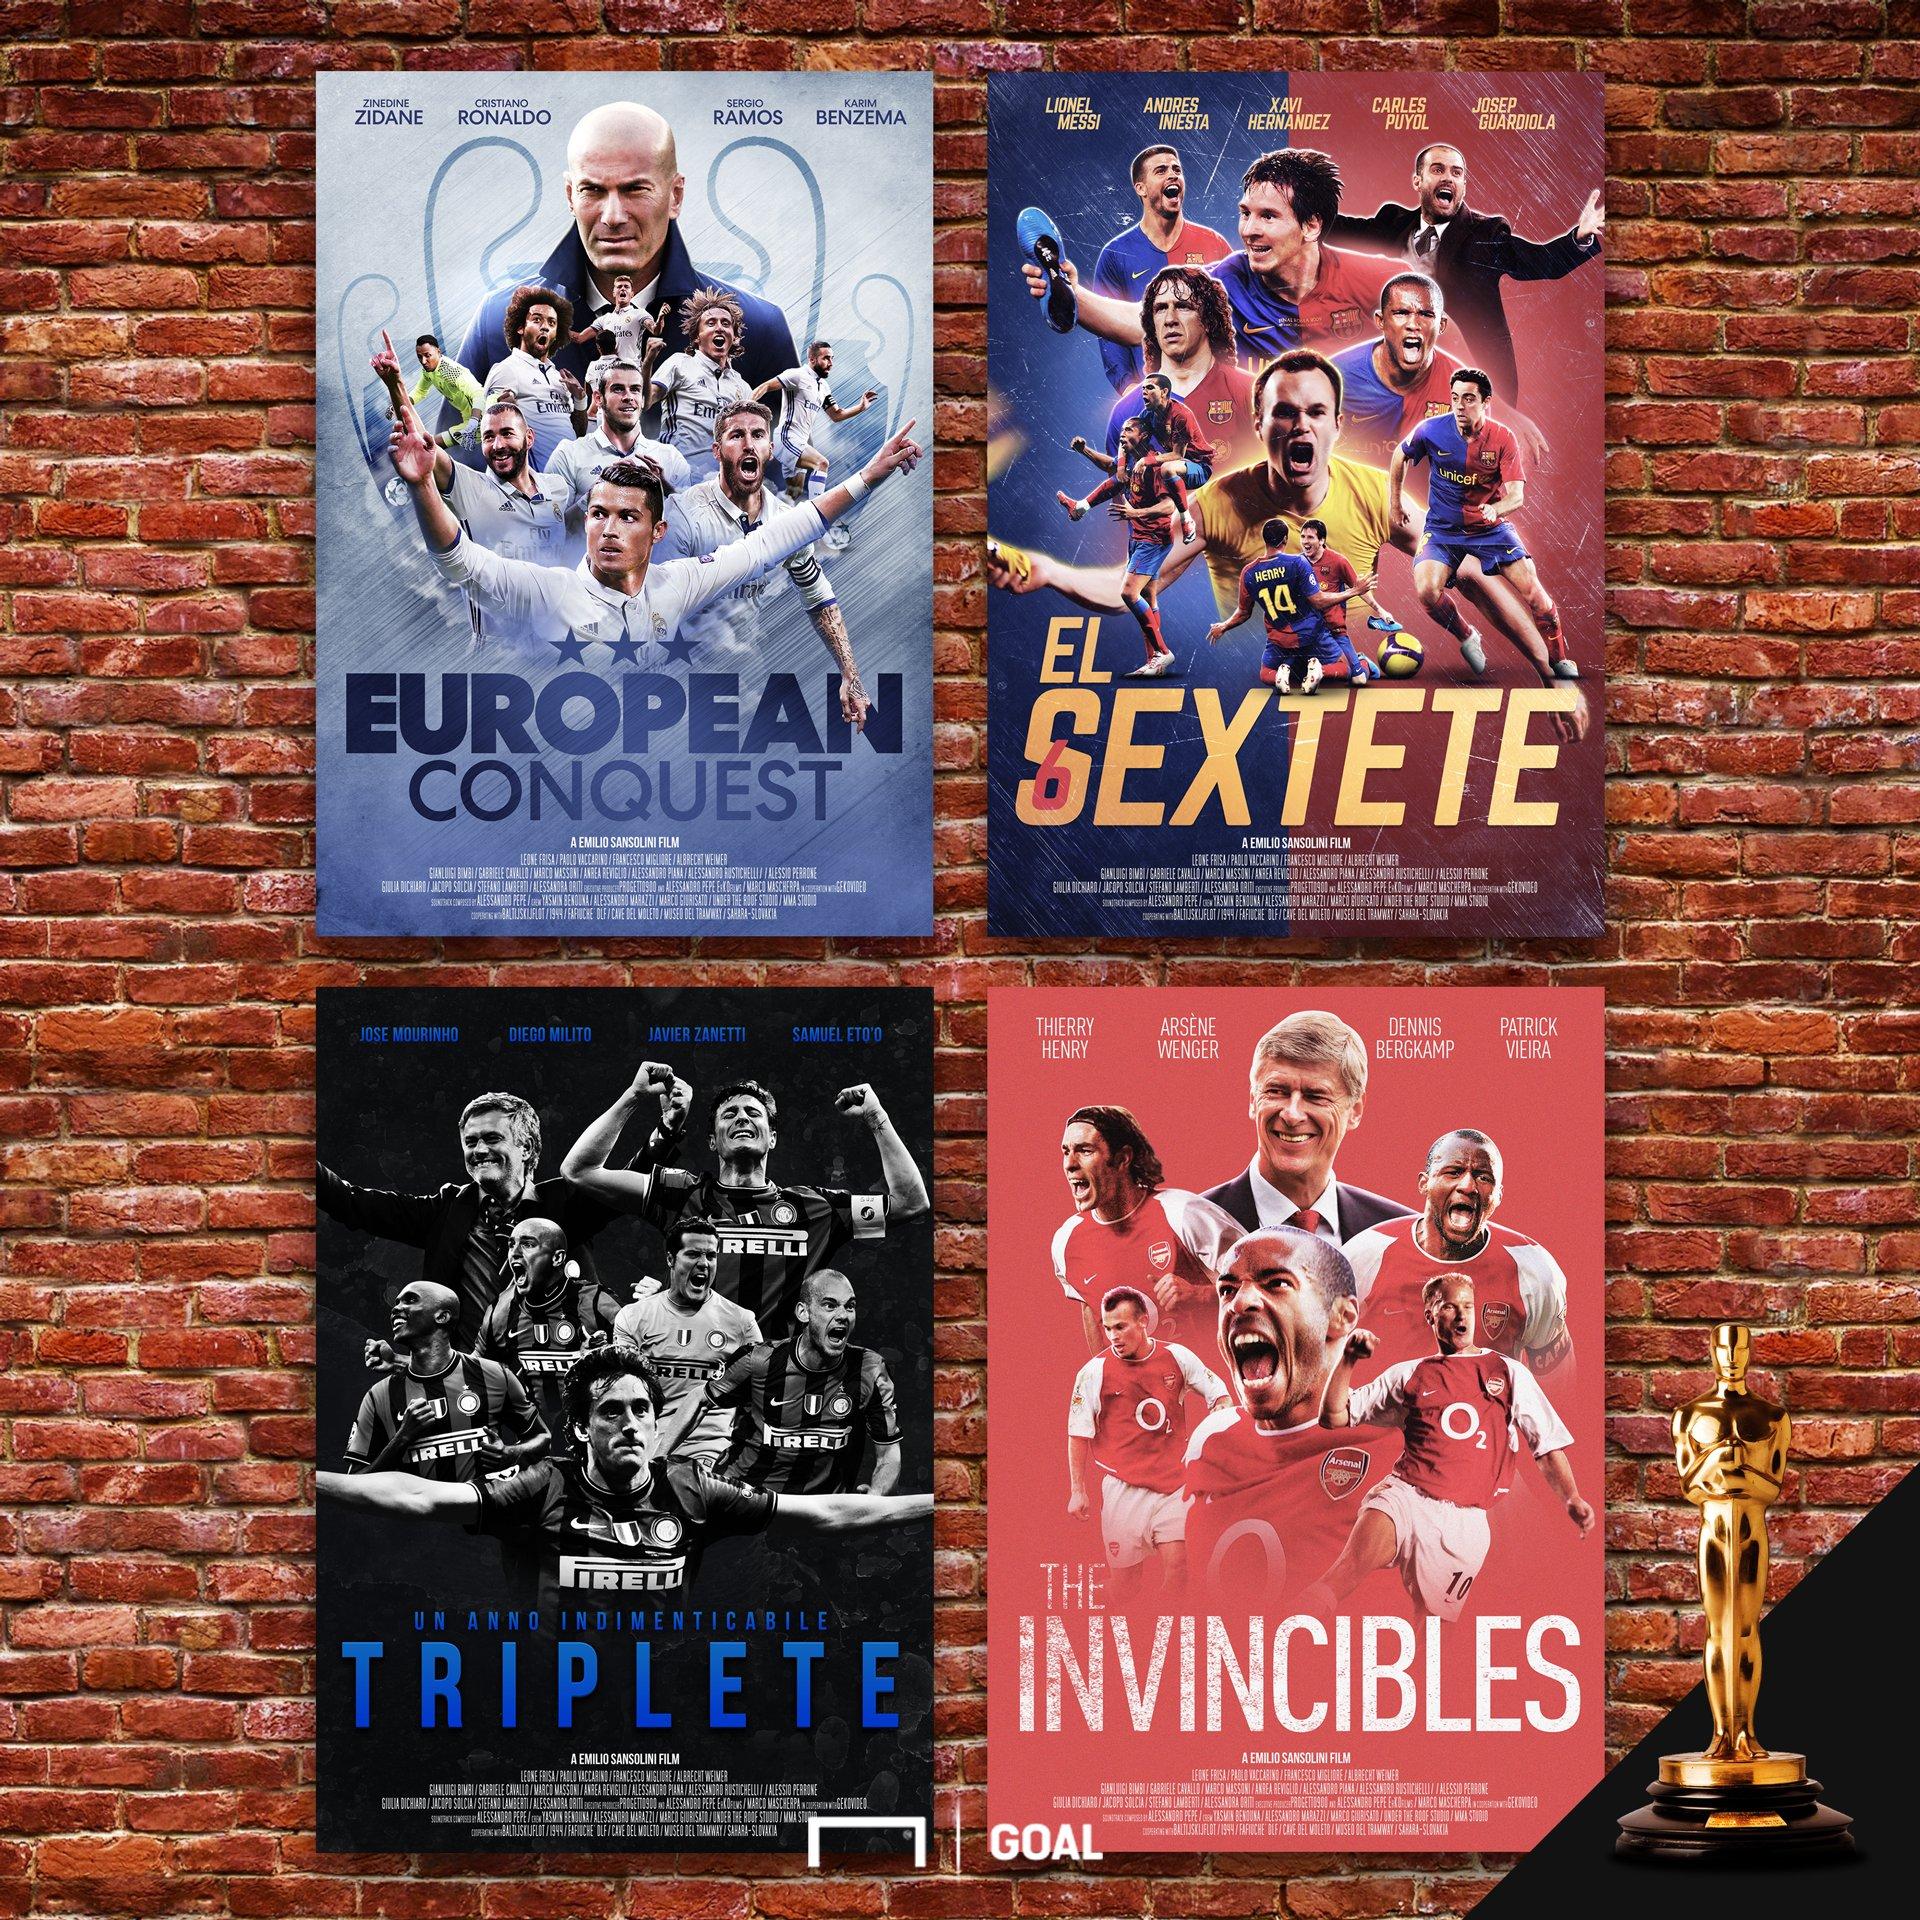 Goal海报:如果,有那么一场足球比赛可以被拍成电影